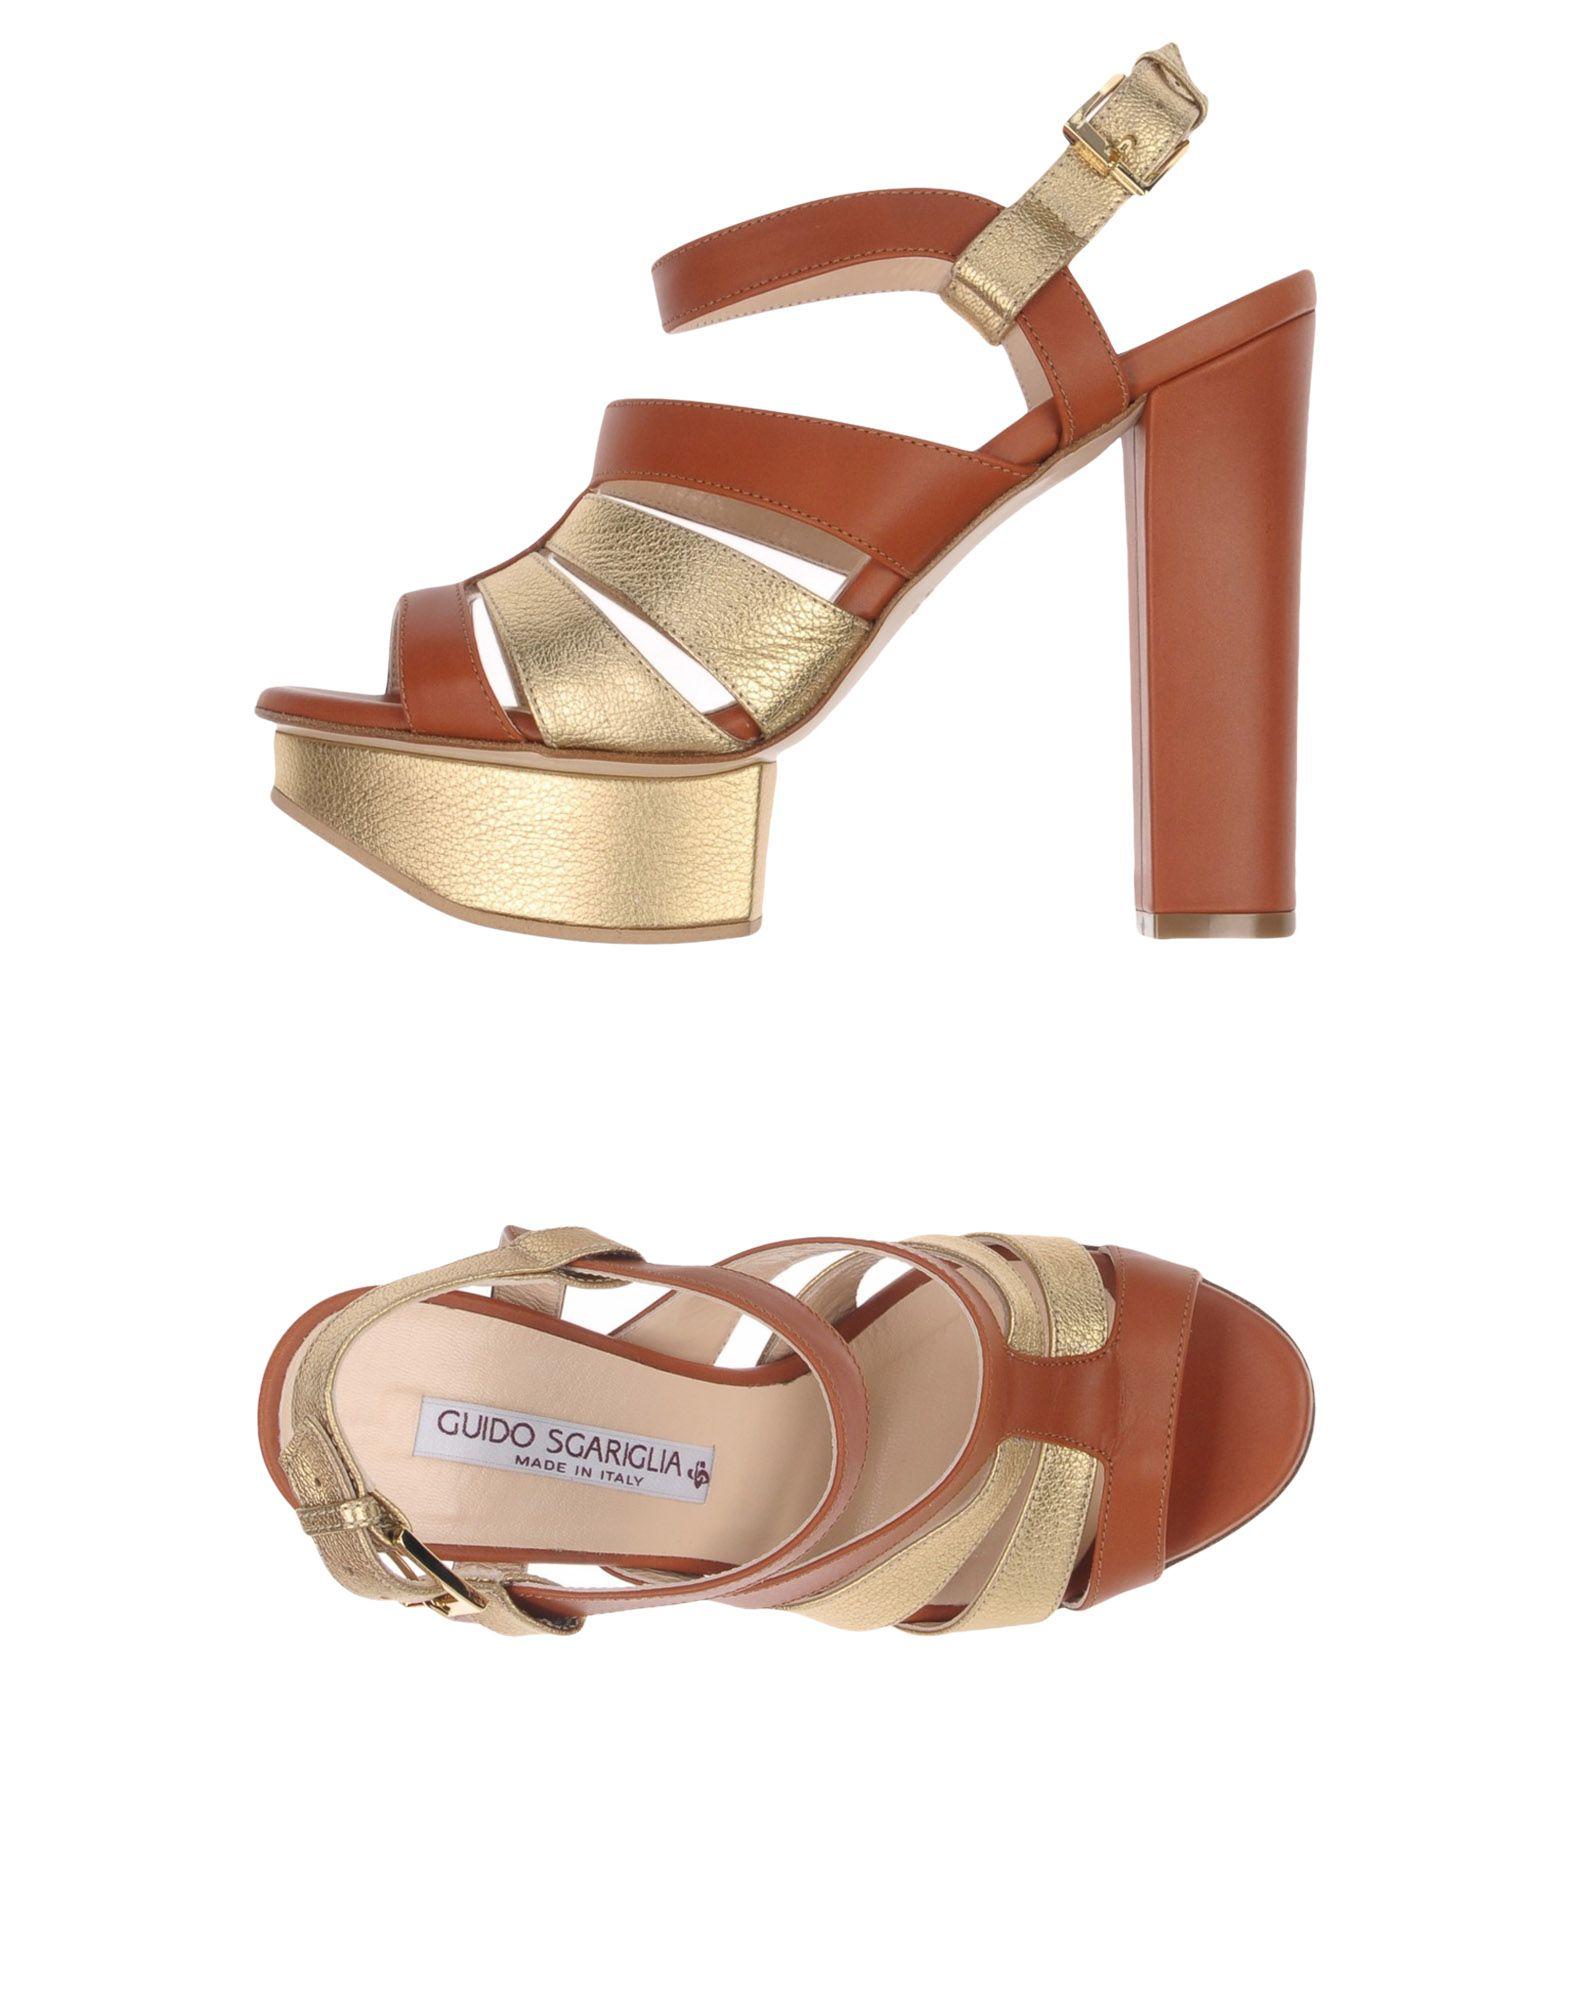 Chaussures - Tribunaux Guido Sgariglia FUvhzIZ